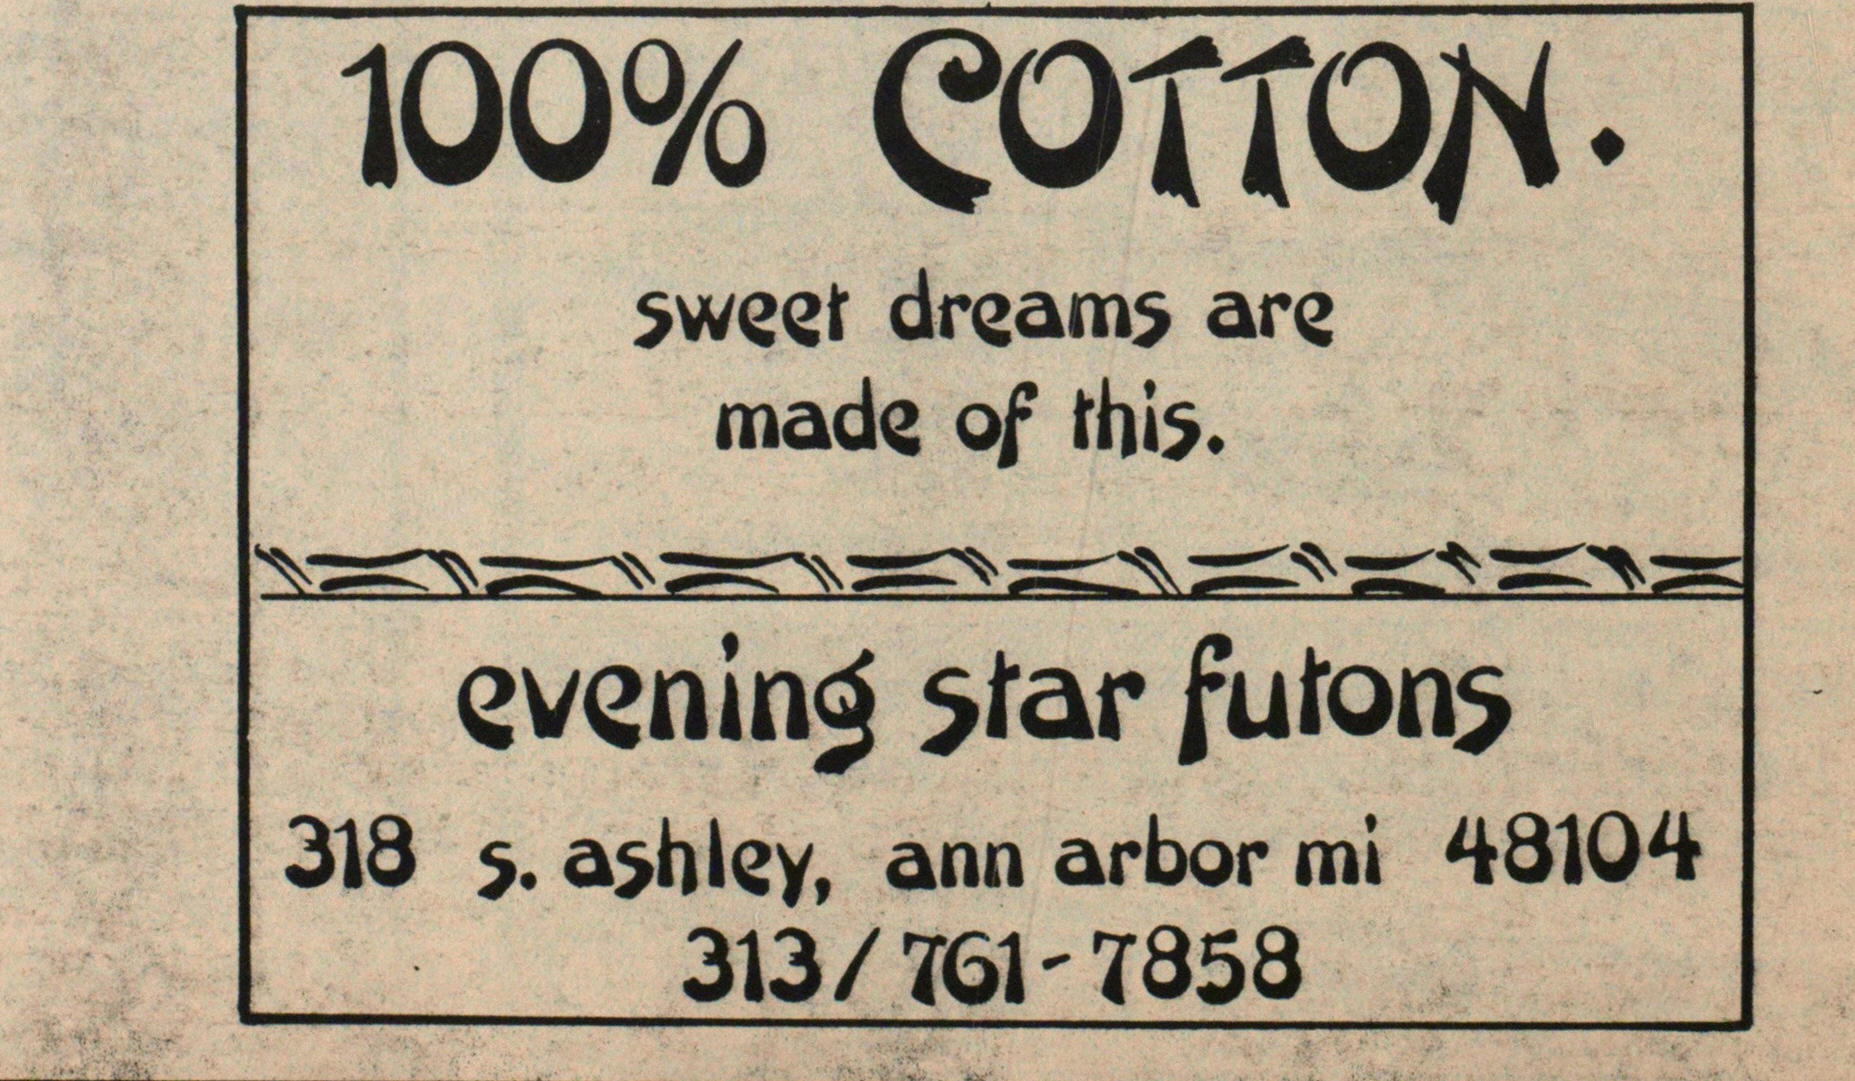 Evening Star Futons Ann Arbor